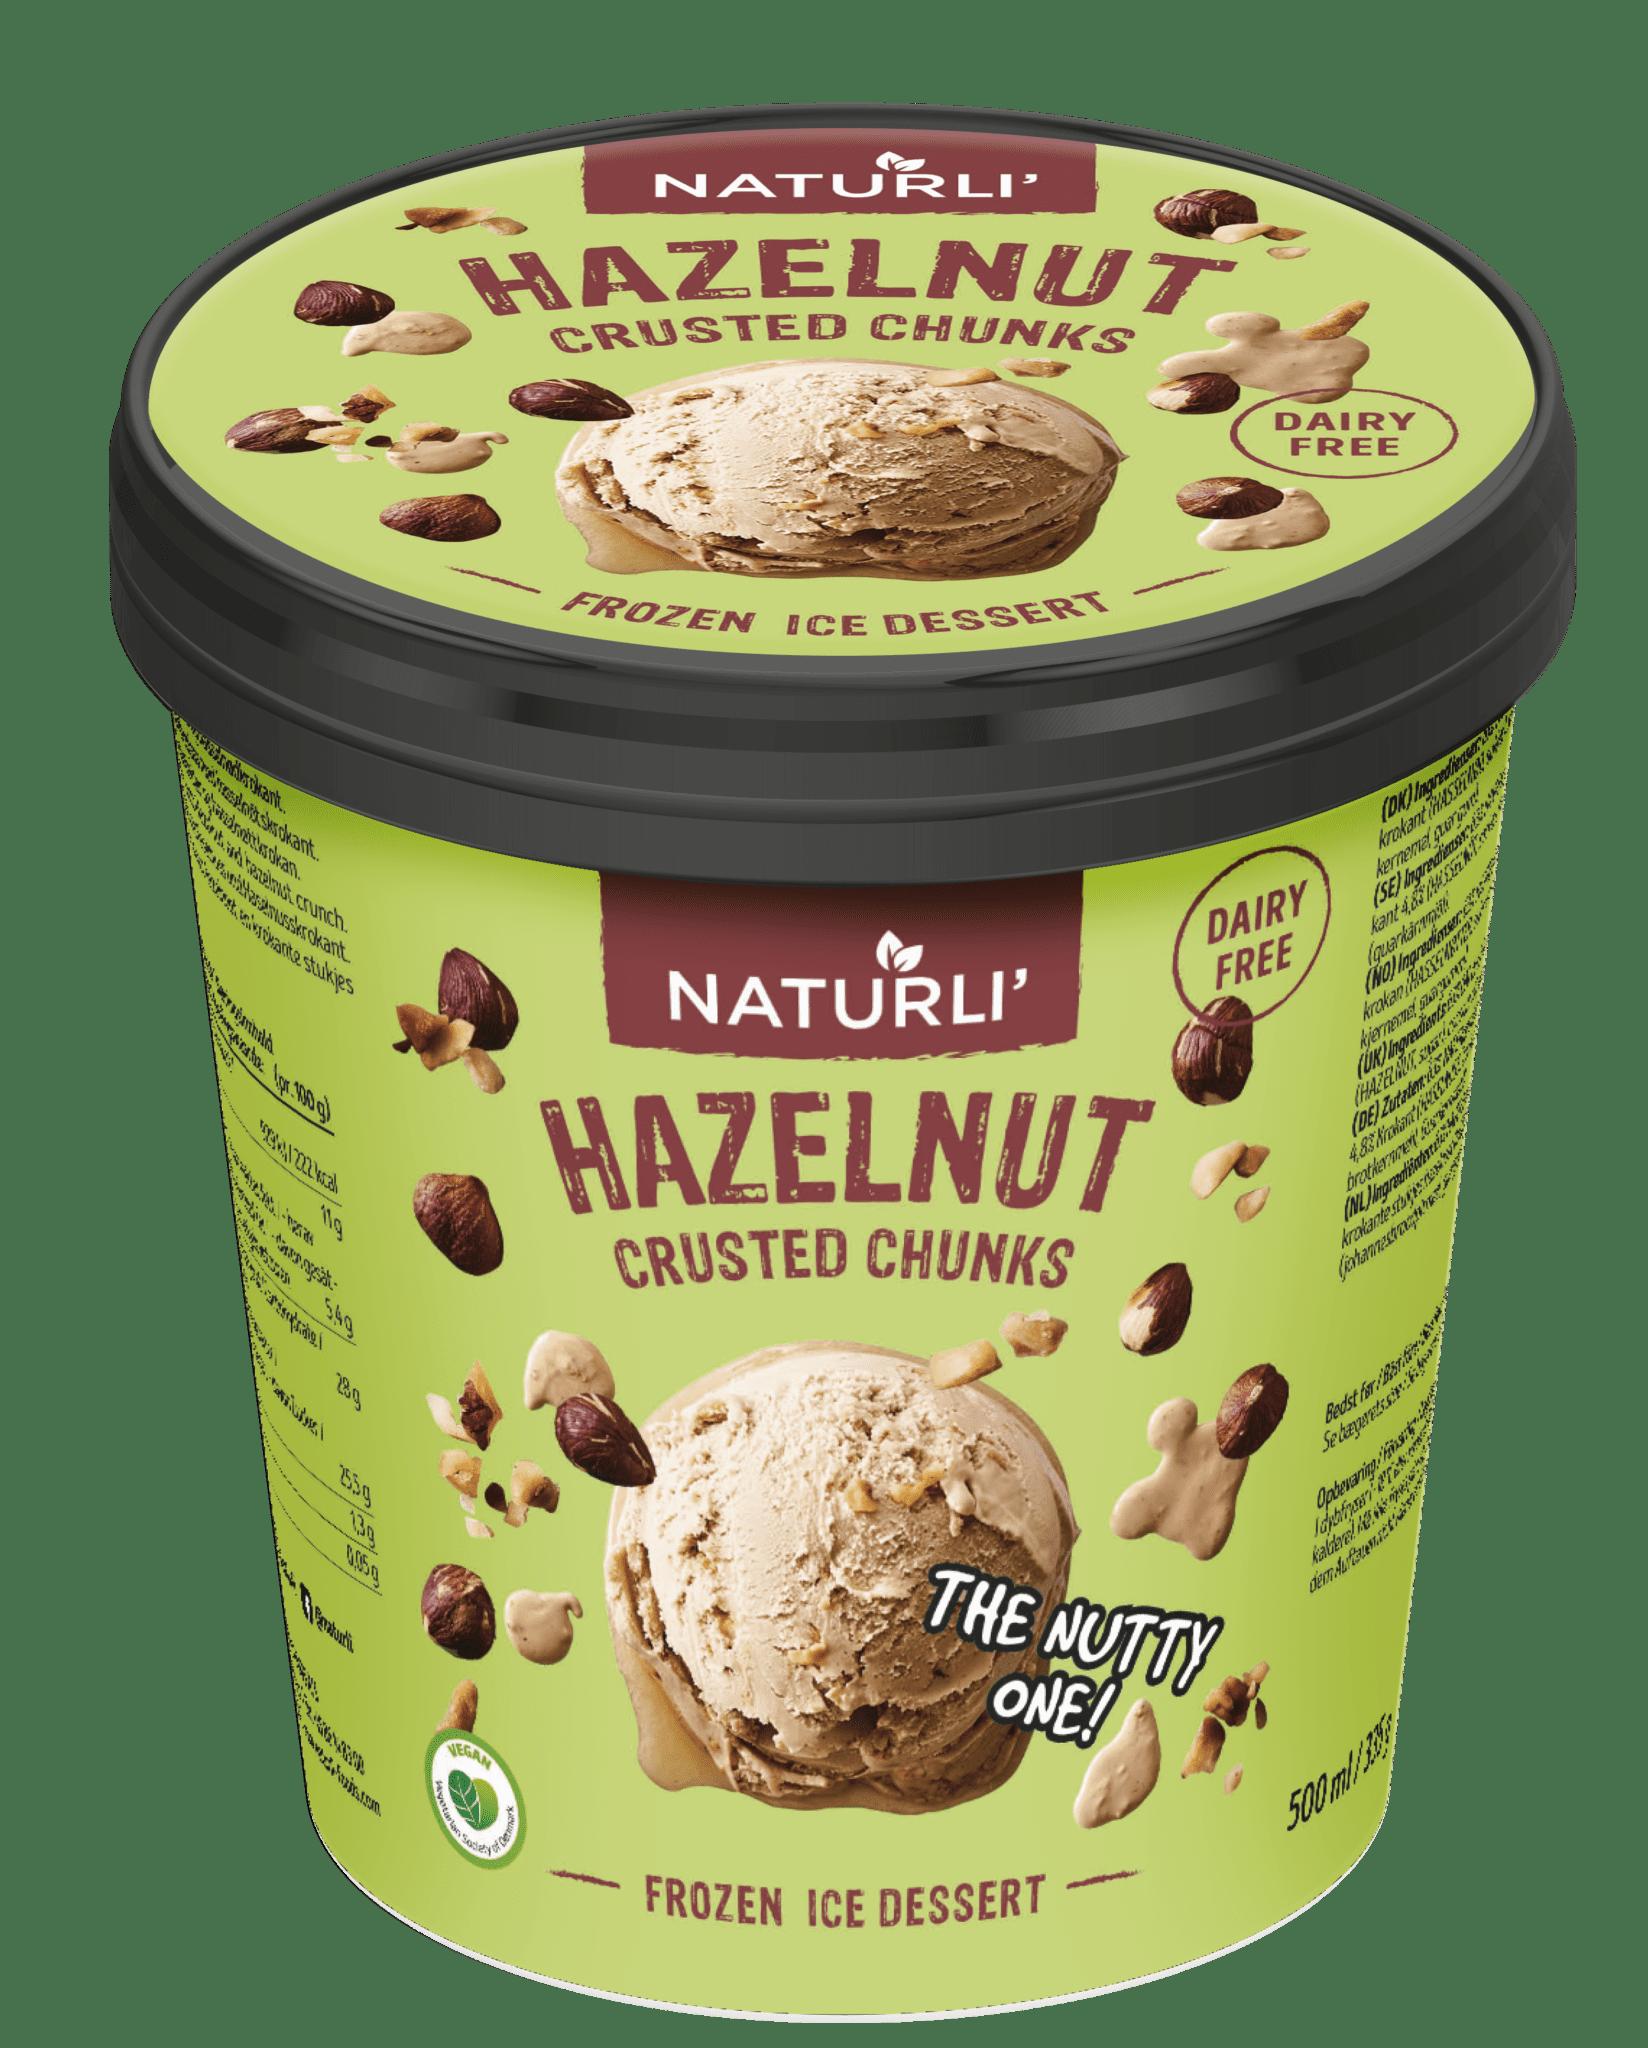 Hazelnut Crusted Chunks